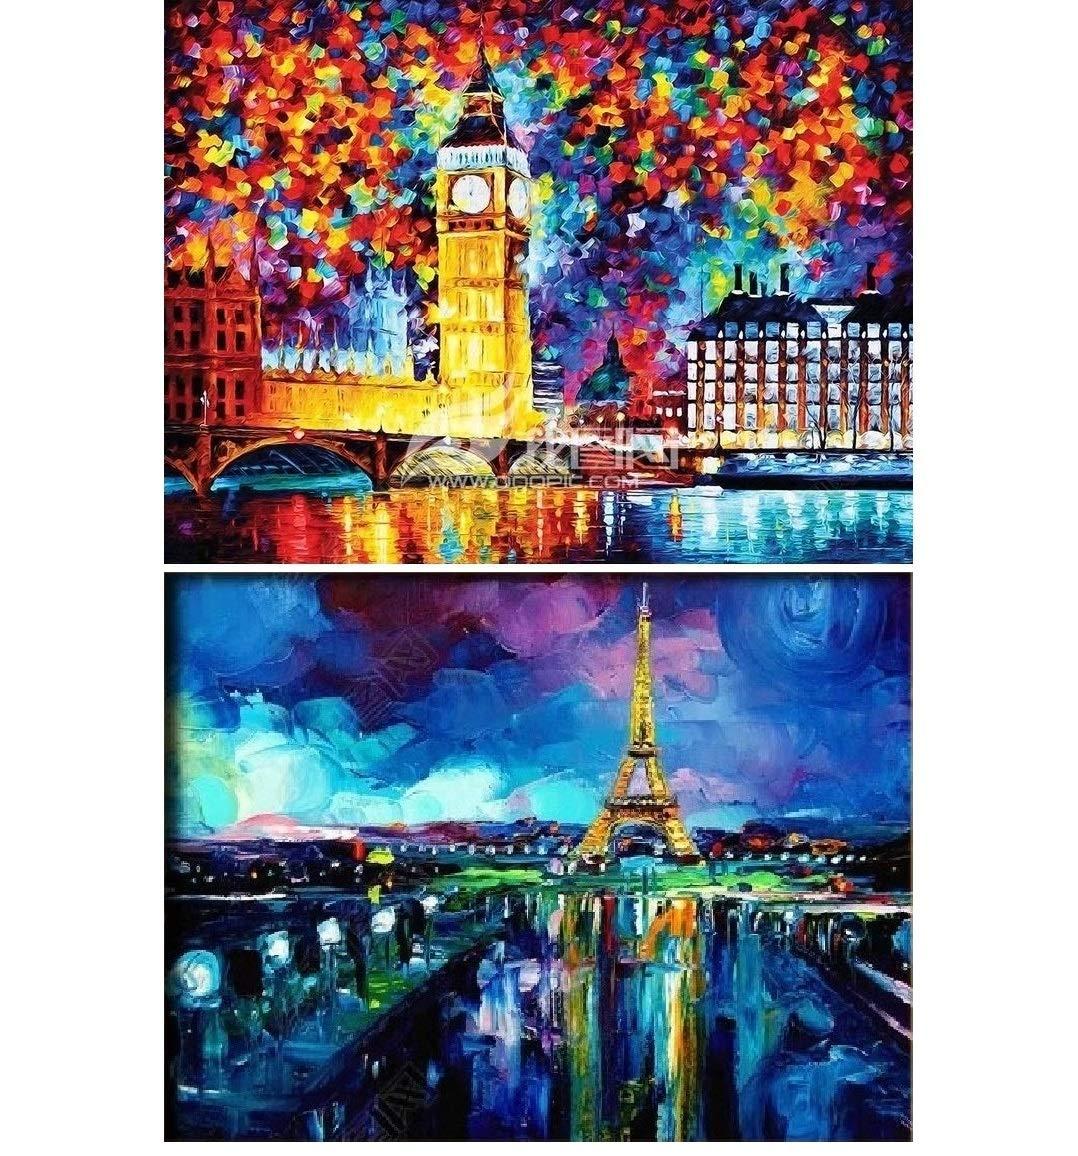 Full Drill Diamond Embroidery Dotz Kit Home Wall Decor 12 x 16 ONEST 2 Packs DIY 5D Diamond Painting Set London and Paris